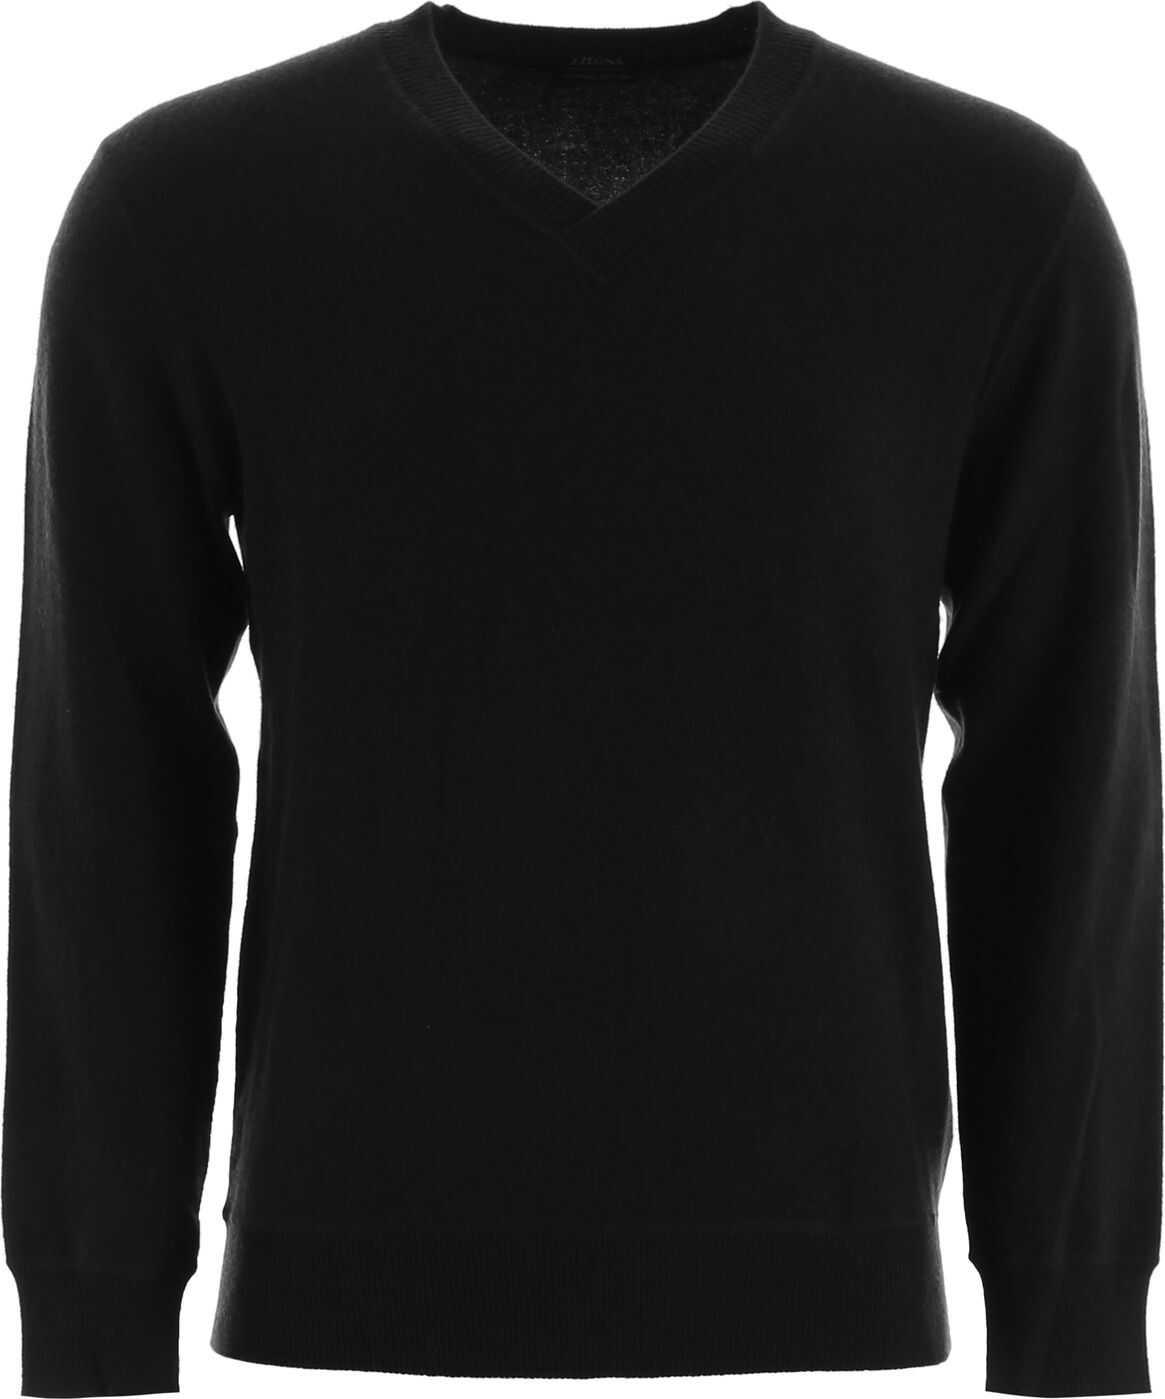 Z Zegna Cashmere Pullover BLACK SLD